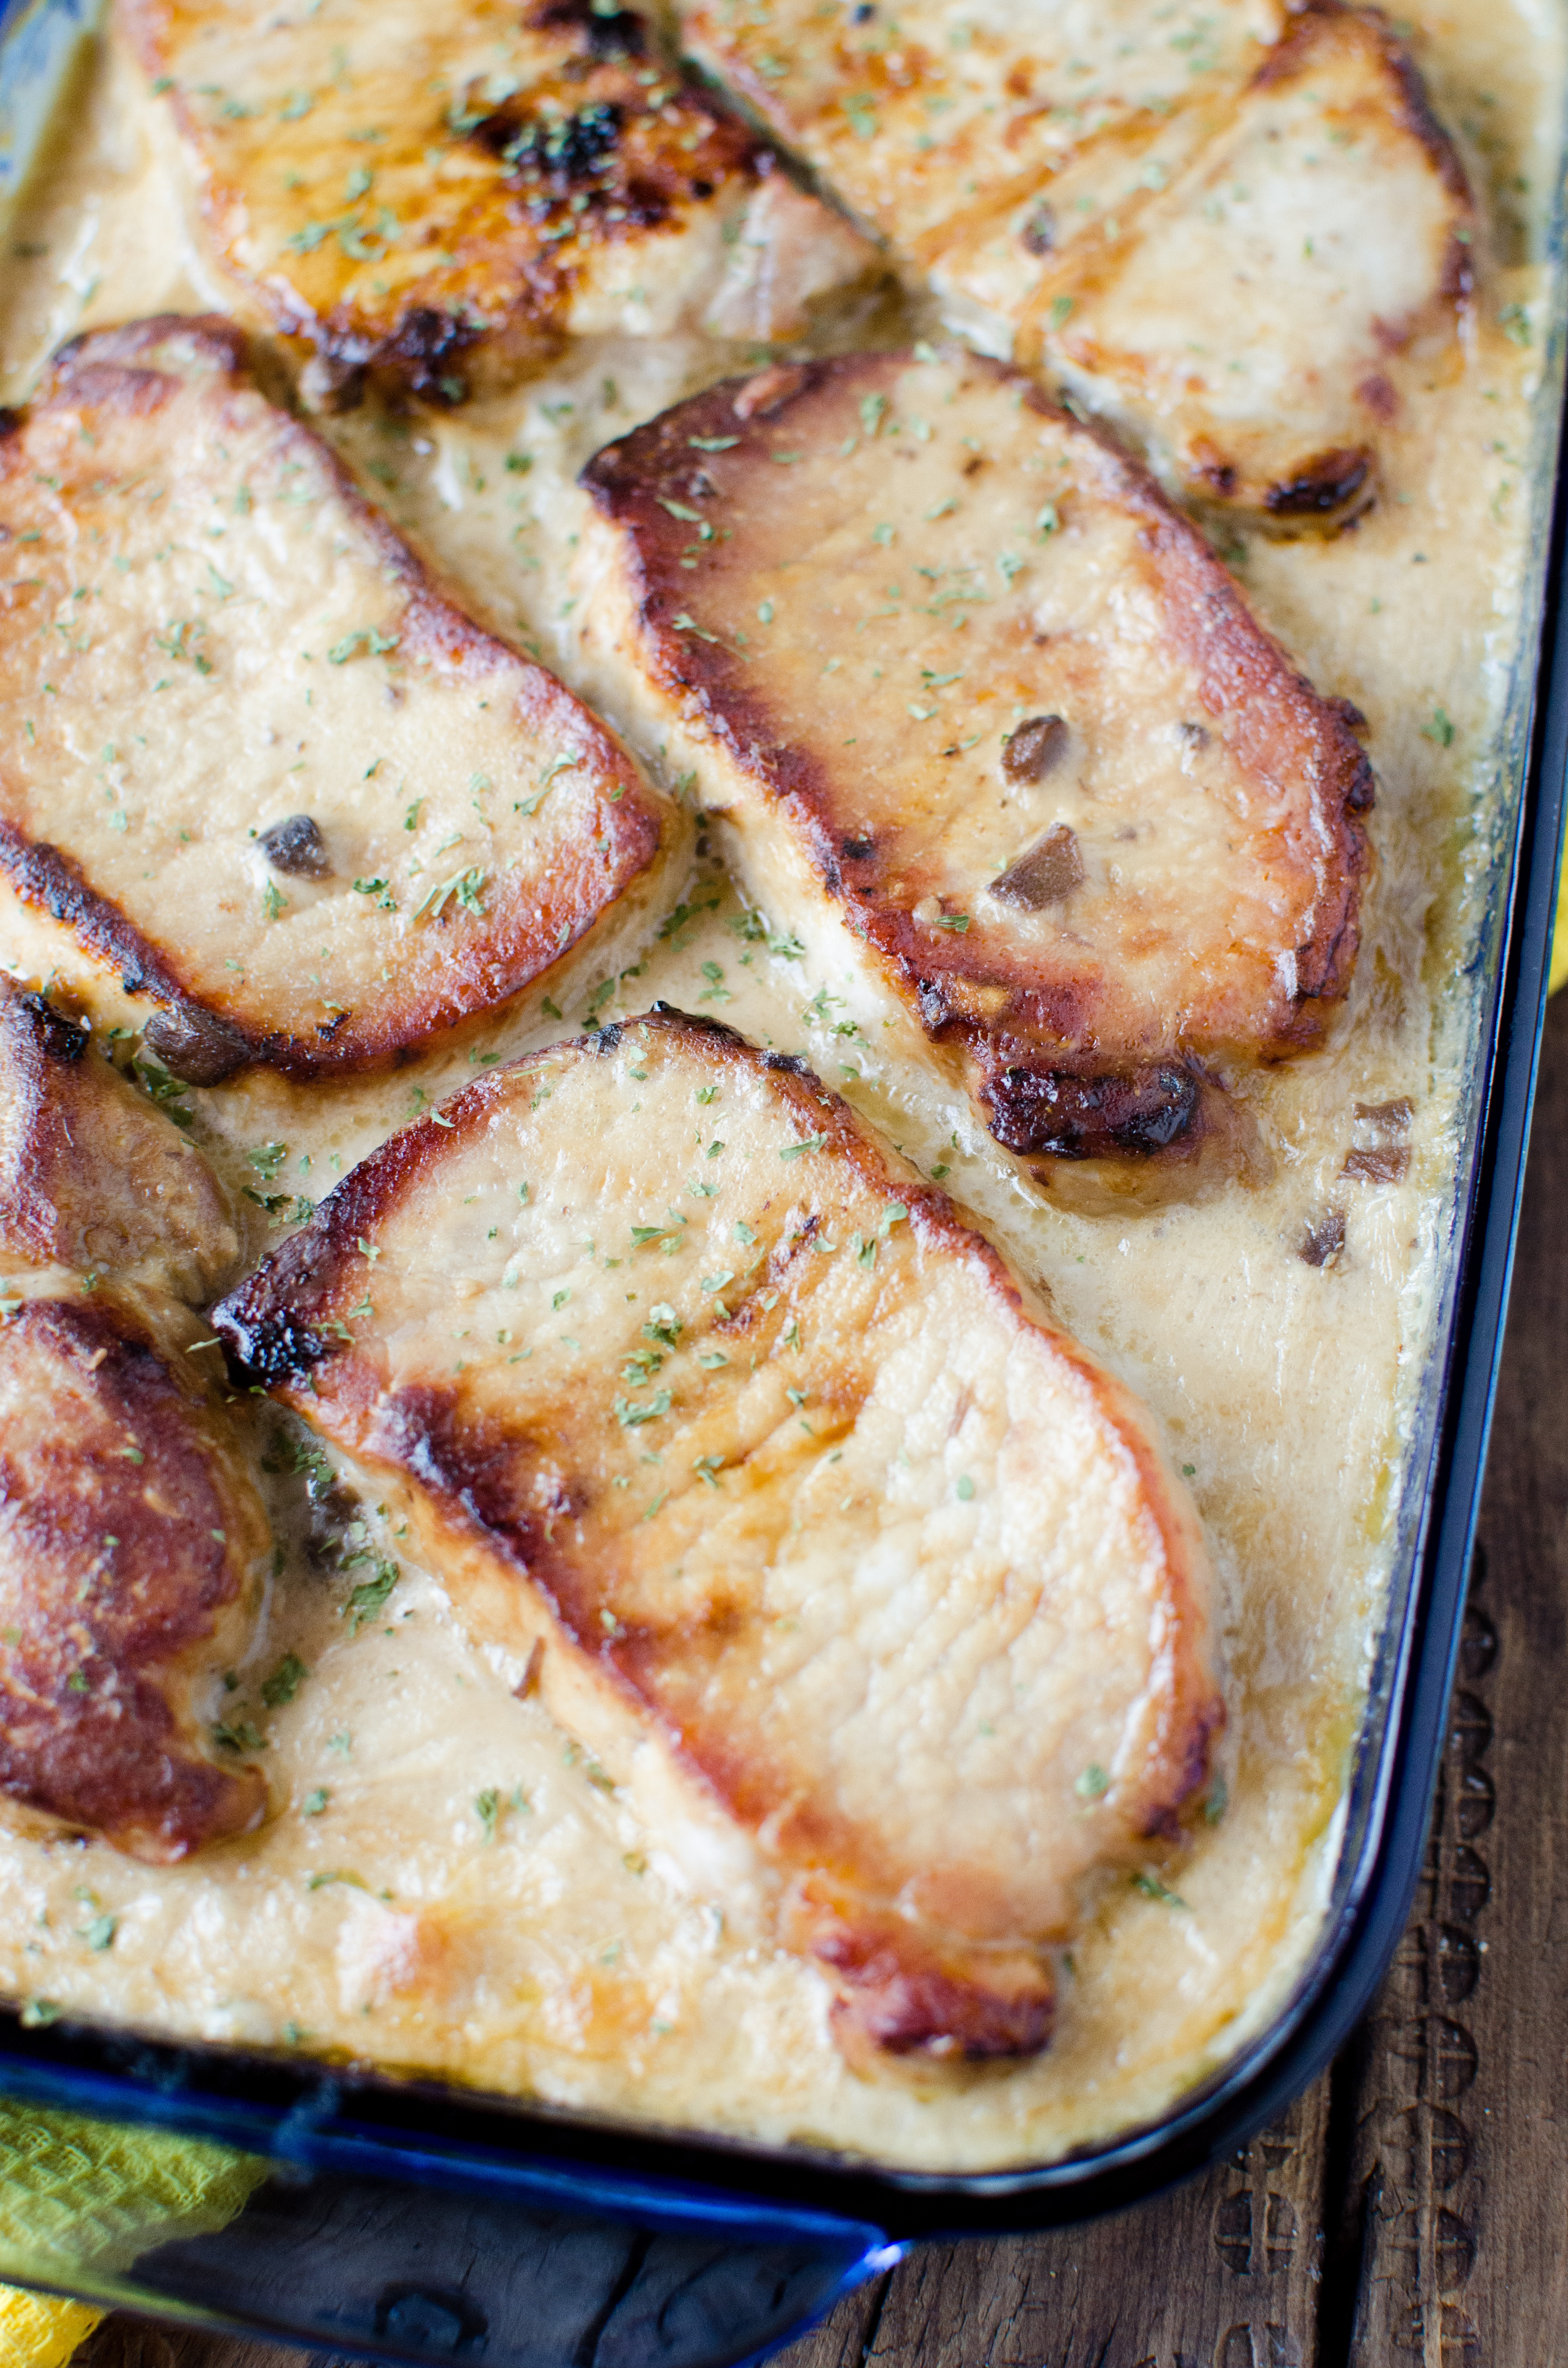 Scalloped Potato Casserole  pork chops and scalloped potatoes with cream of mushroom soup